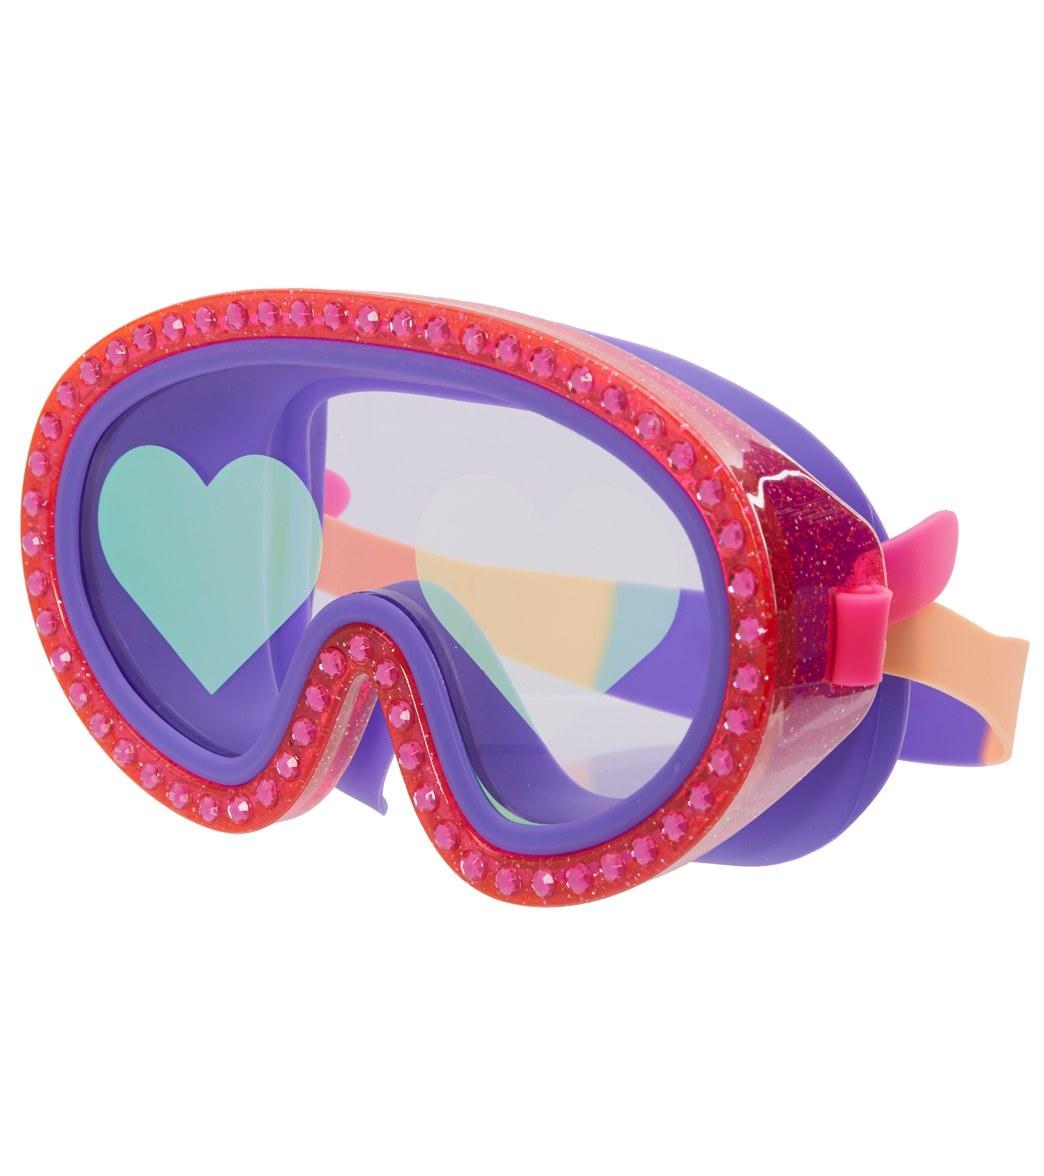 d52d79732e6e Bling2O Kids  Rock Star Heart Swim Mask at SwimOutlet.com